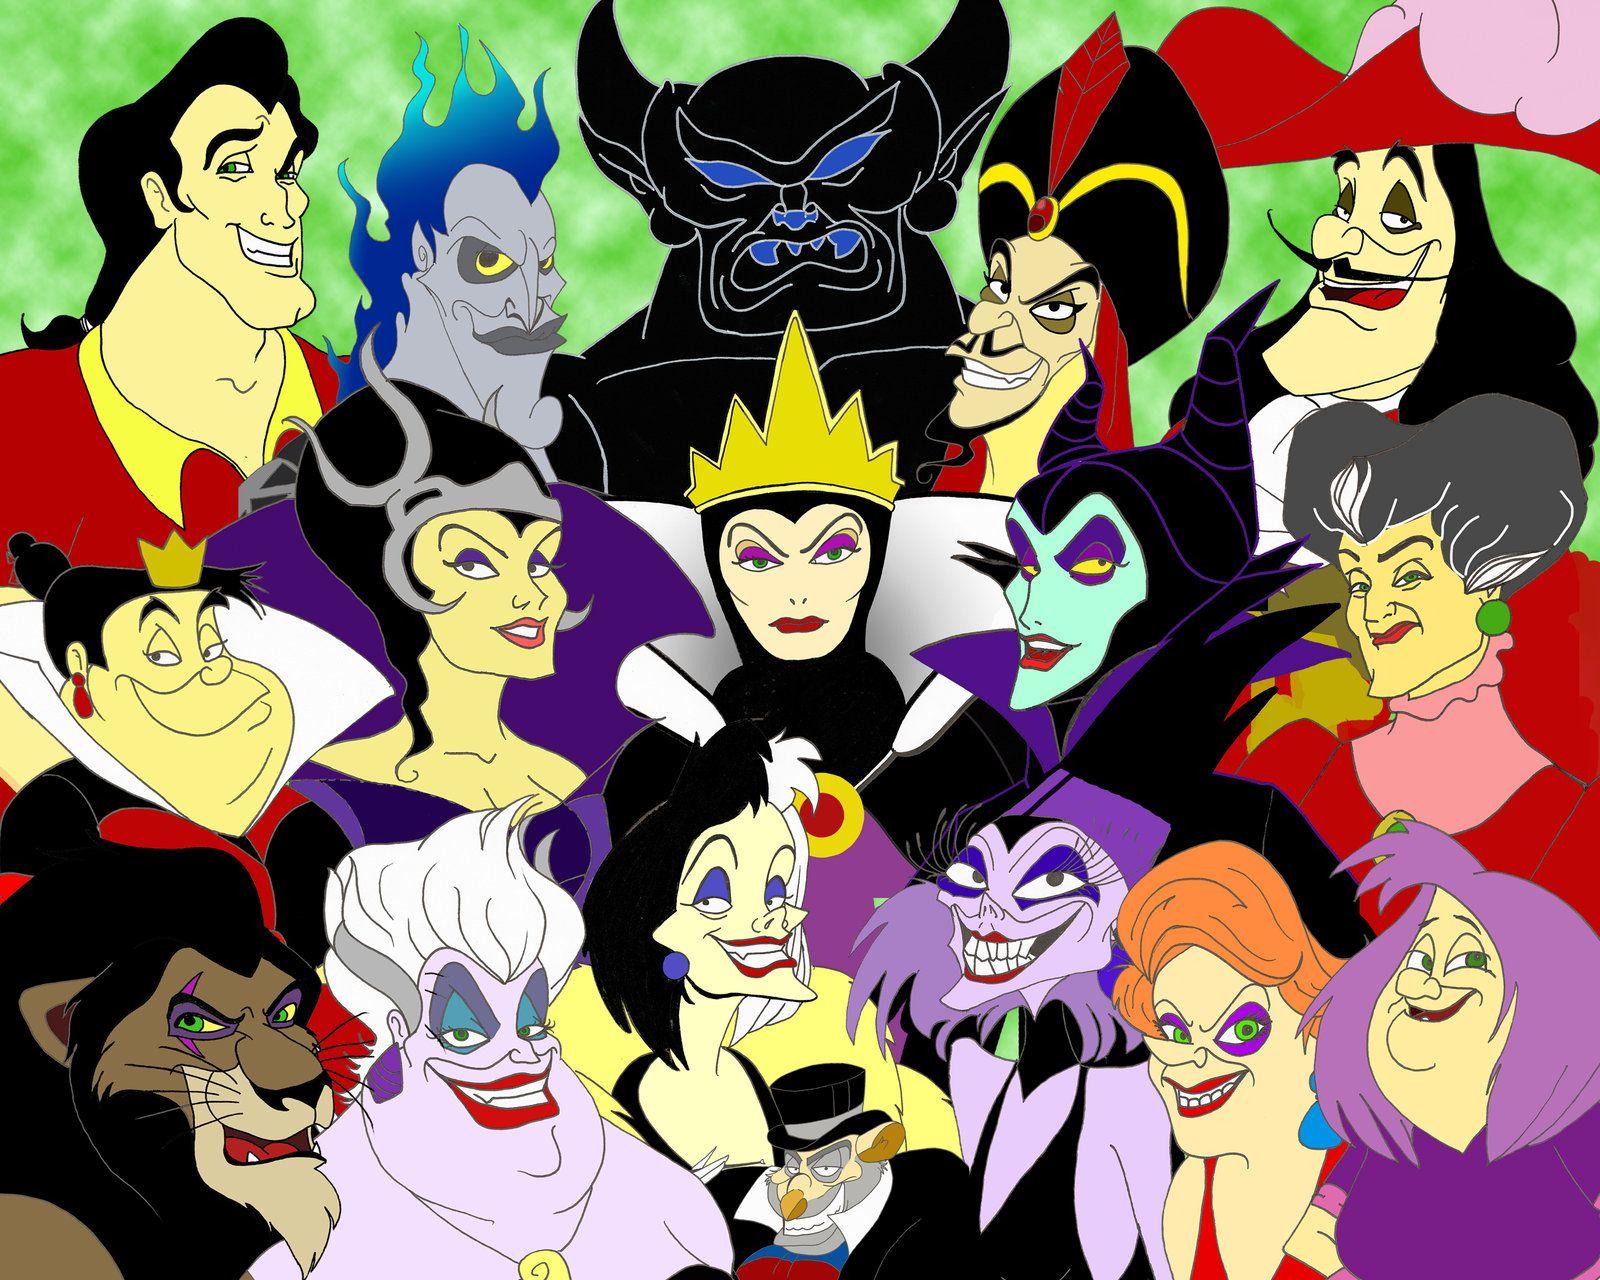 All Disney Villains